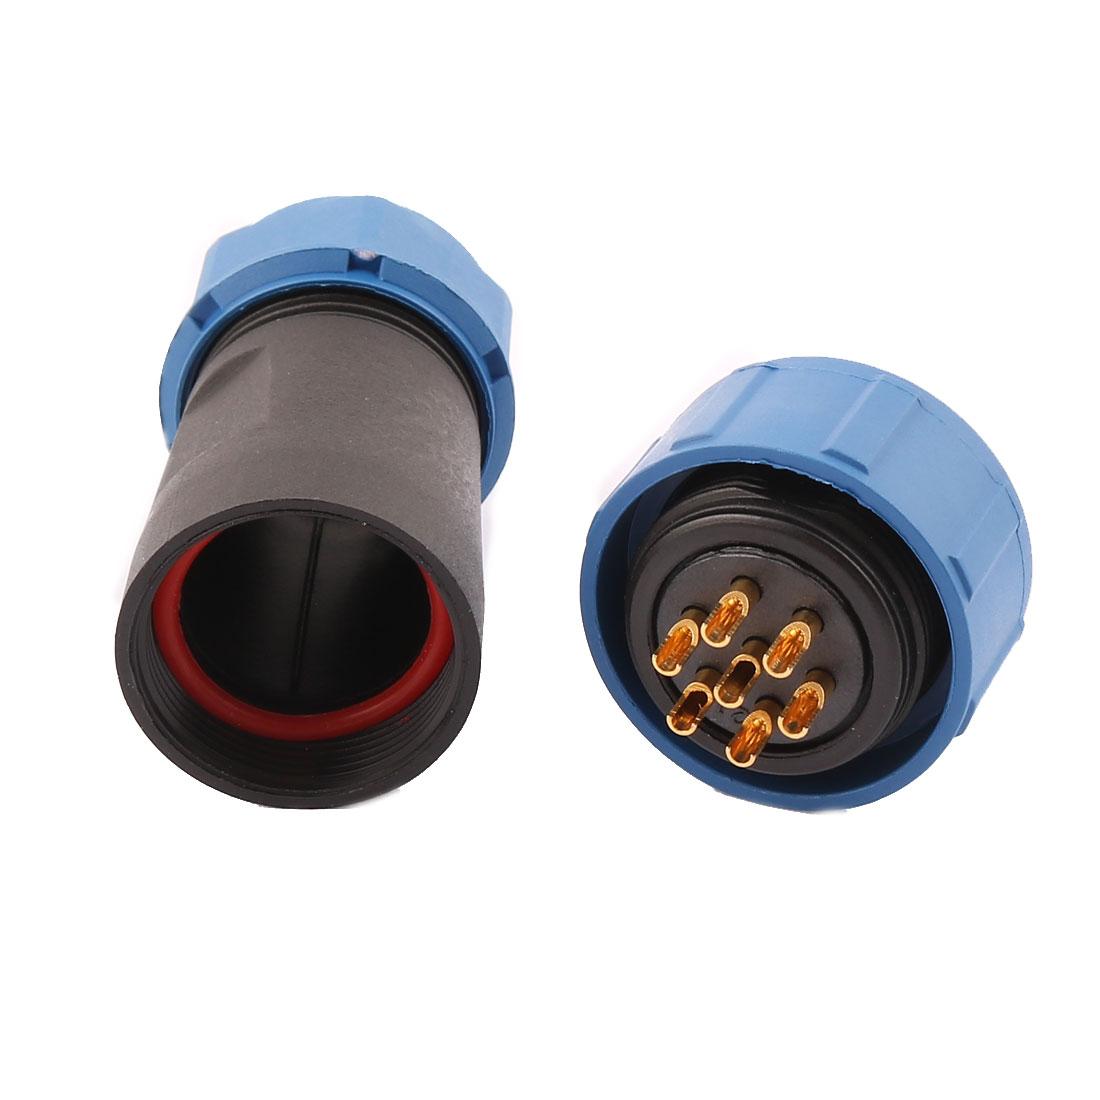 AC 500V 7 Poles SP2110/S Waterproof Aviation Socket Dustproof Adapter Connector